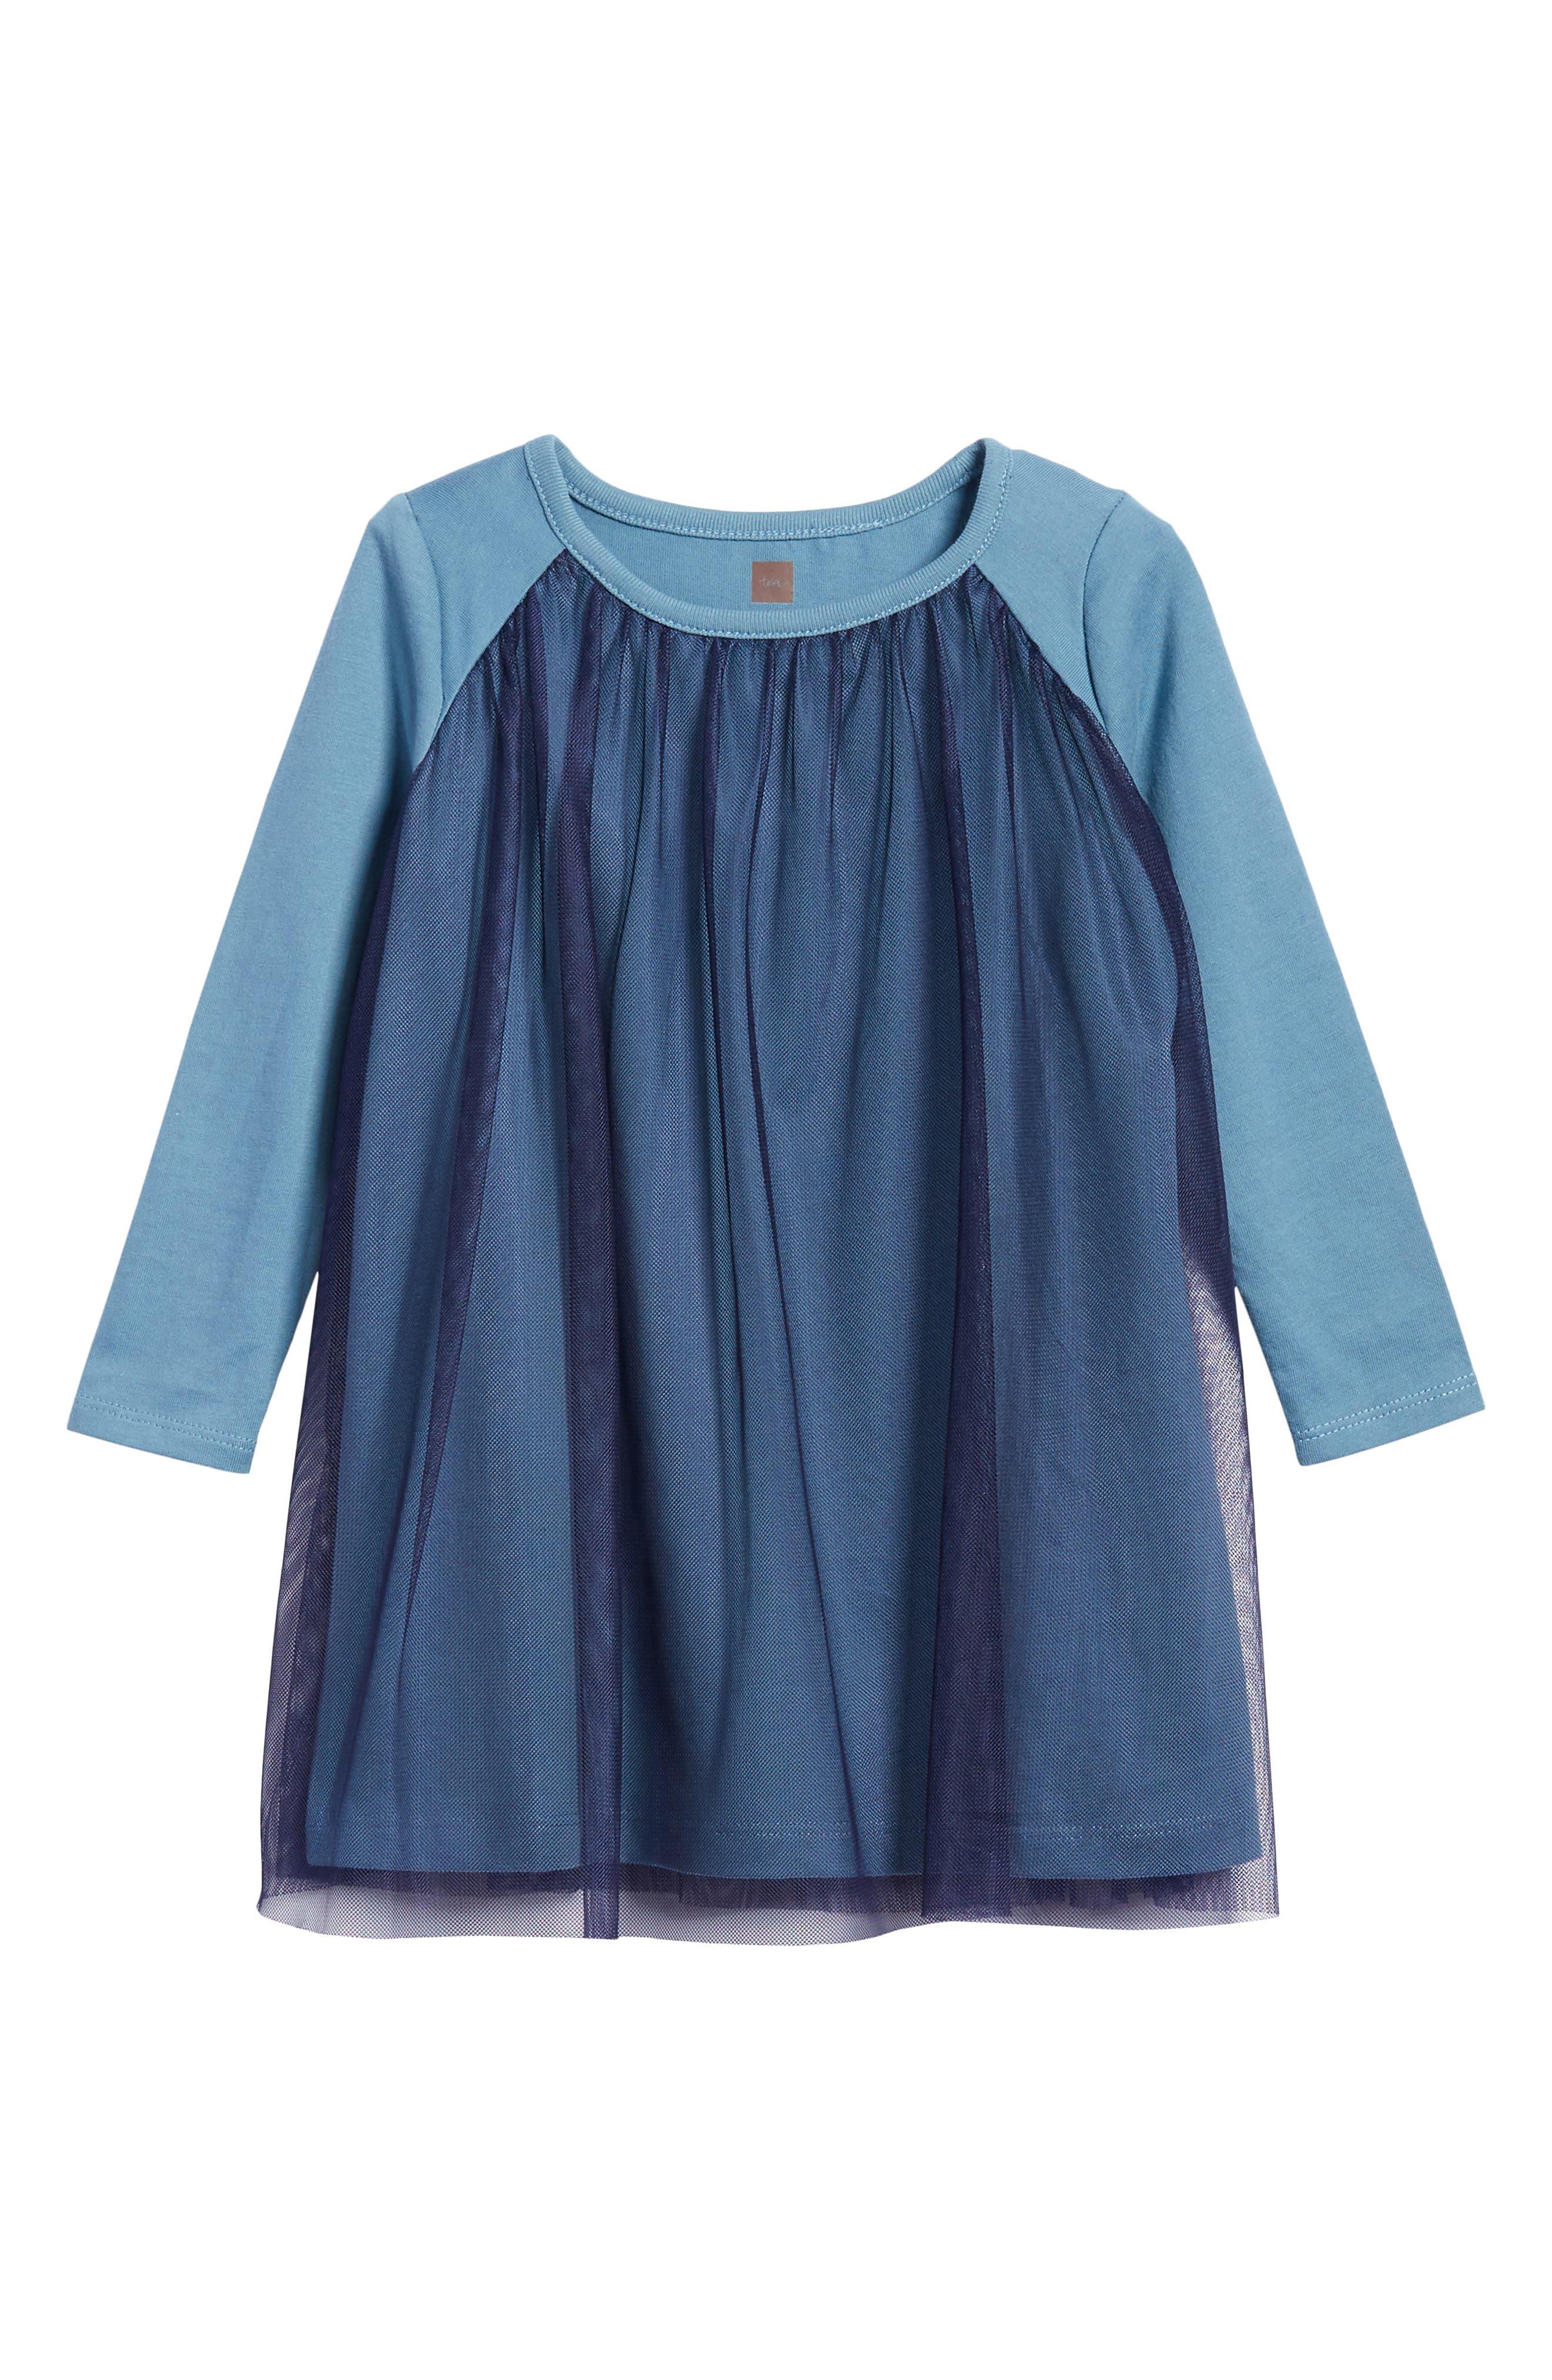 Alternate Image 1 Selected - Tea Collection Mackenzie Tulle Dress (Toddler Girls, Little Girls & Big Girls)